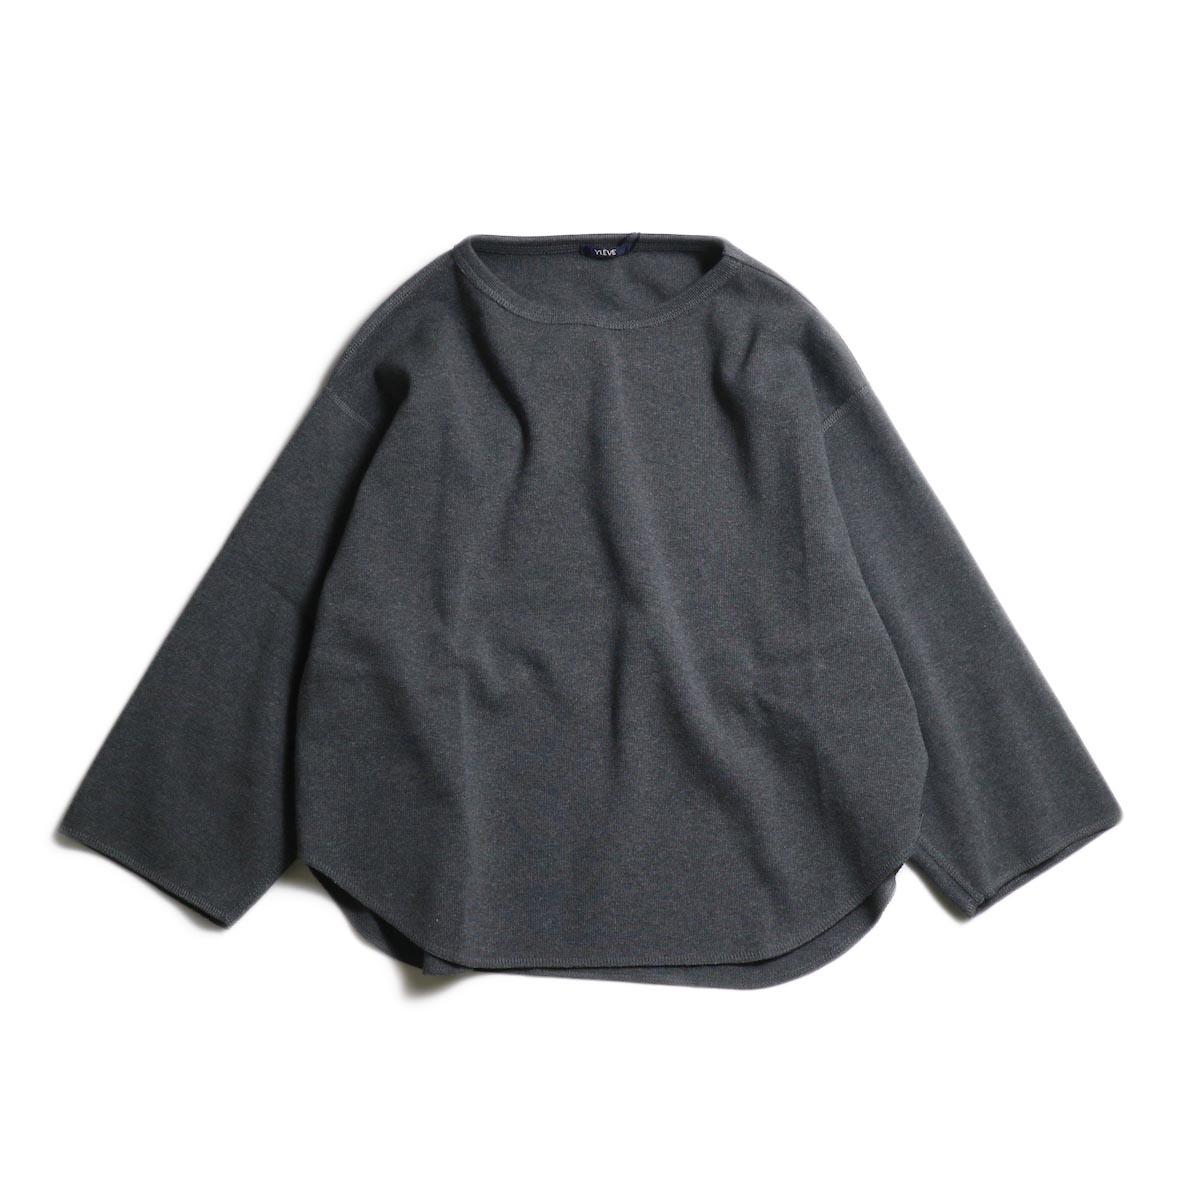 YLEVE / Cotton Rib Heather Grey P/O (Charcoal)